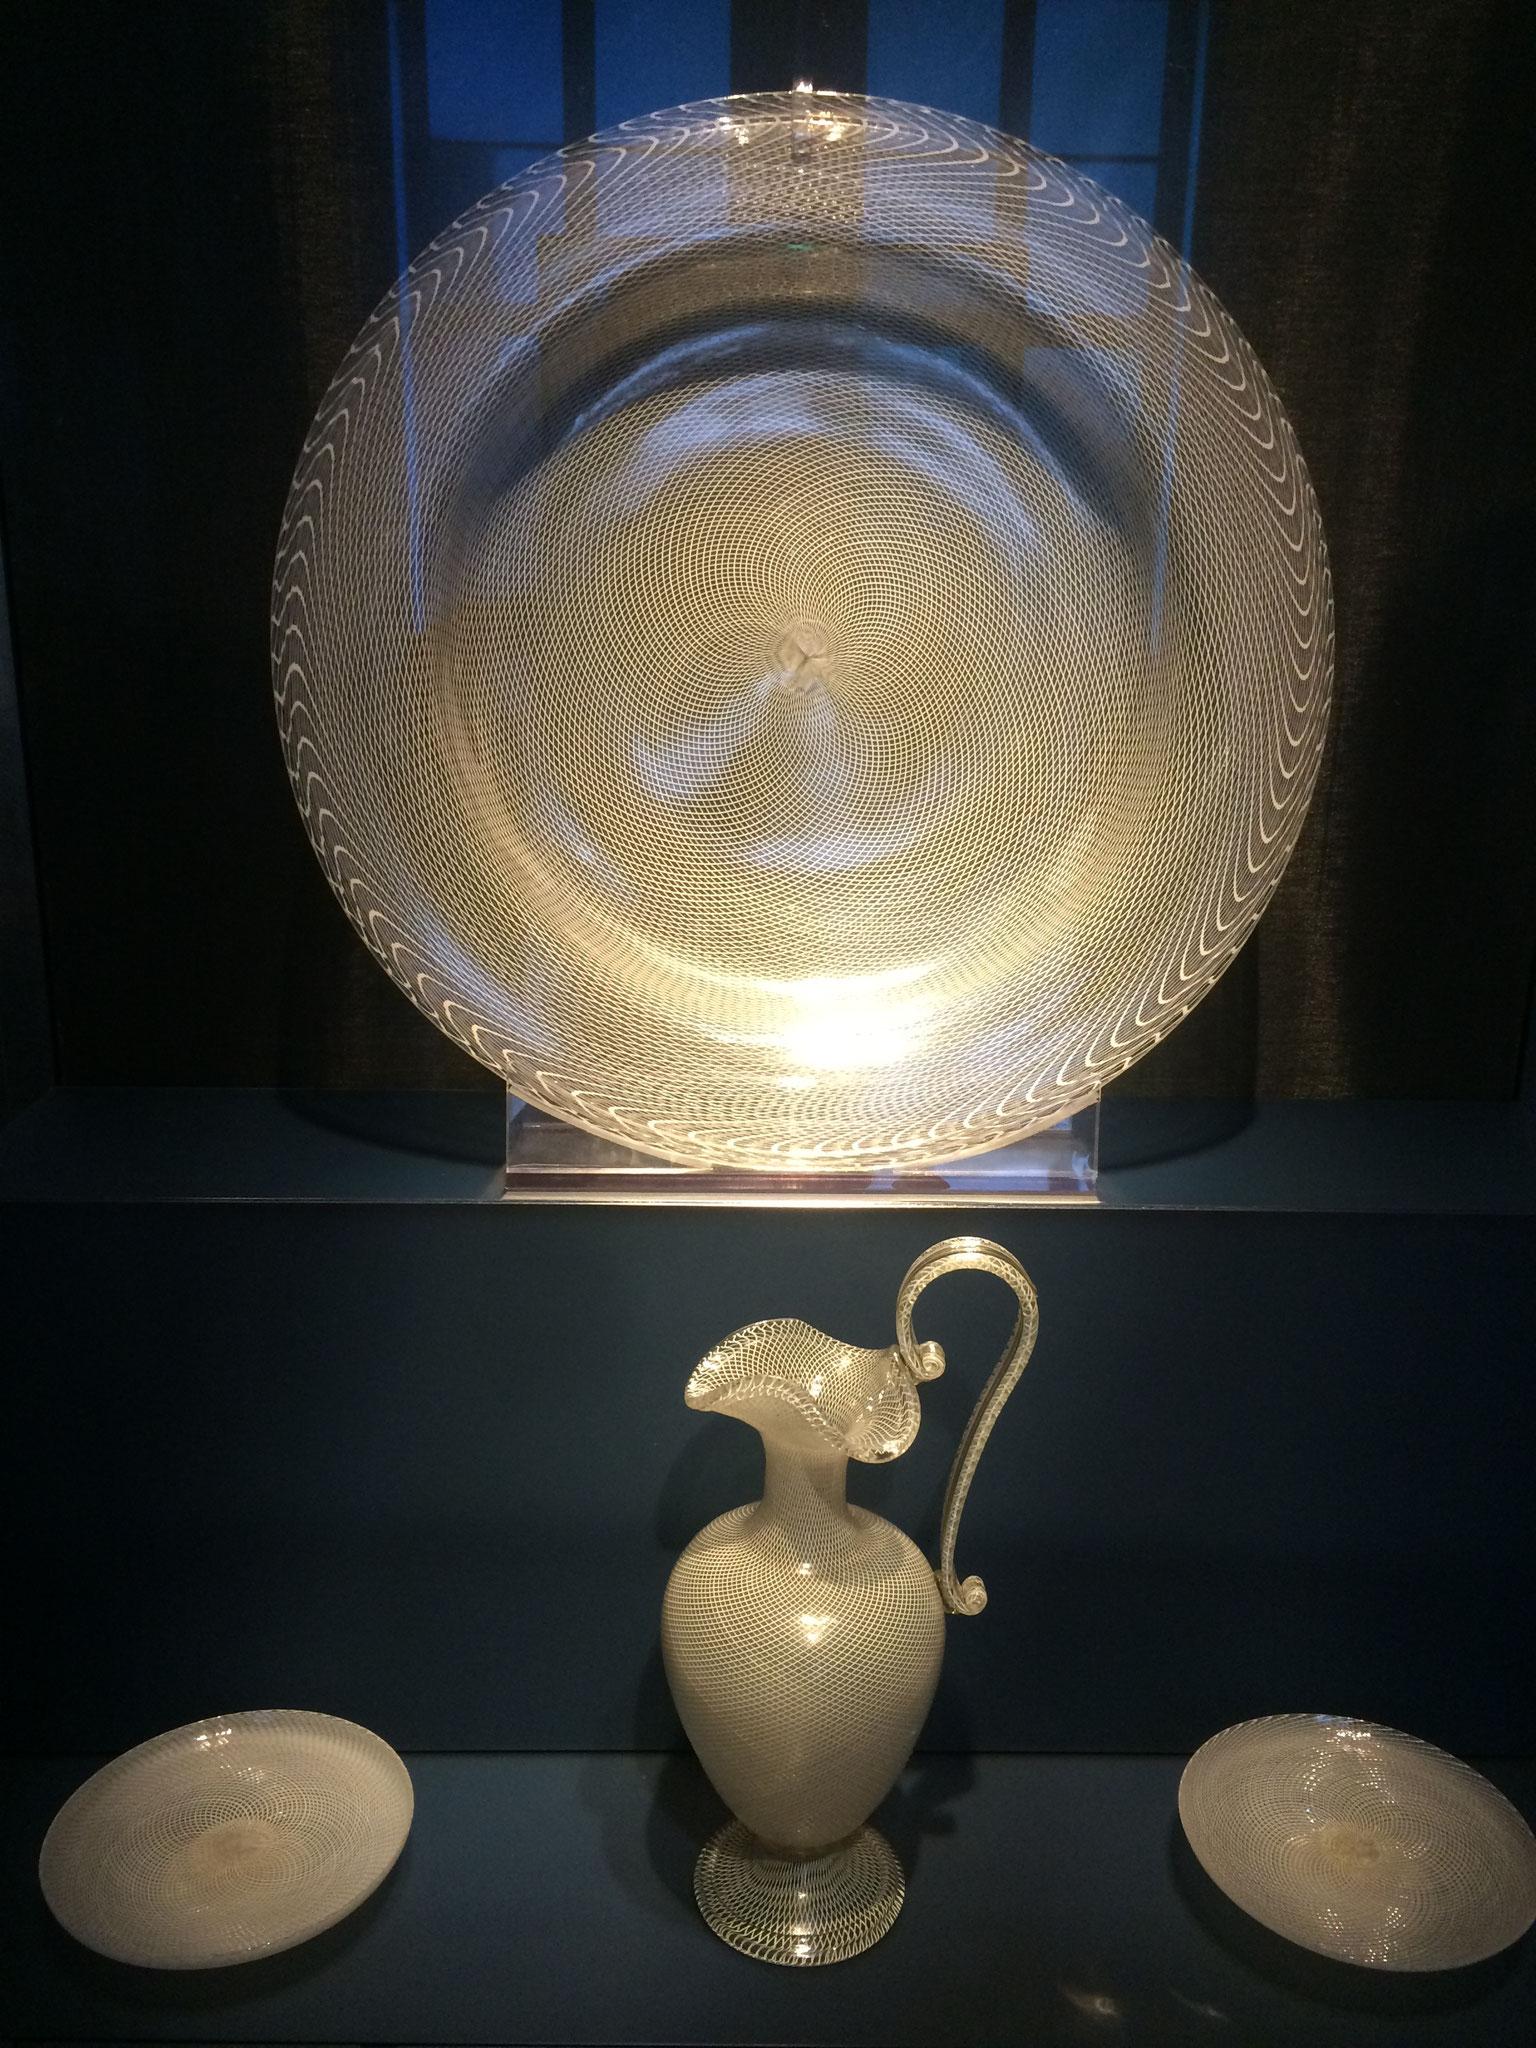 Venezianisches Netzglas